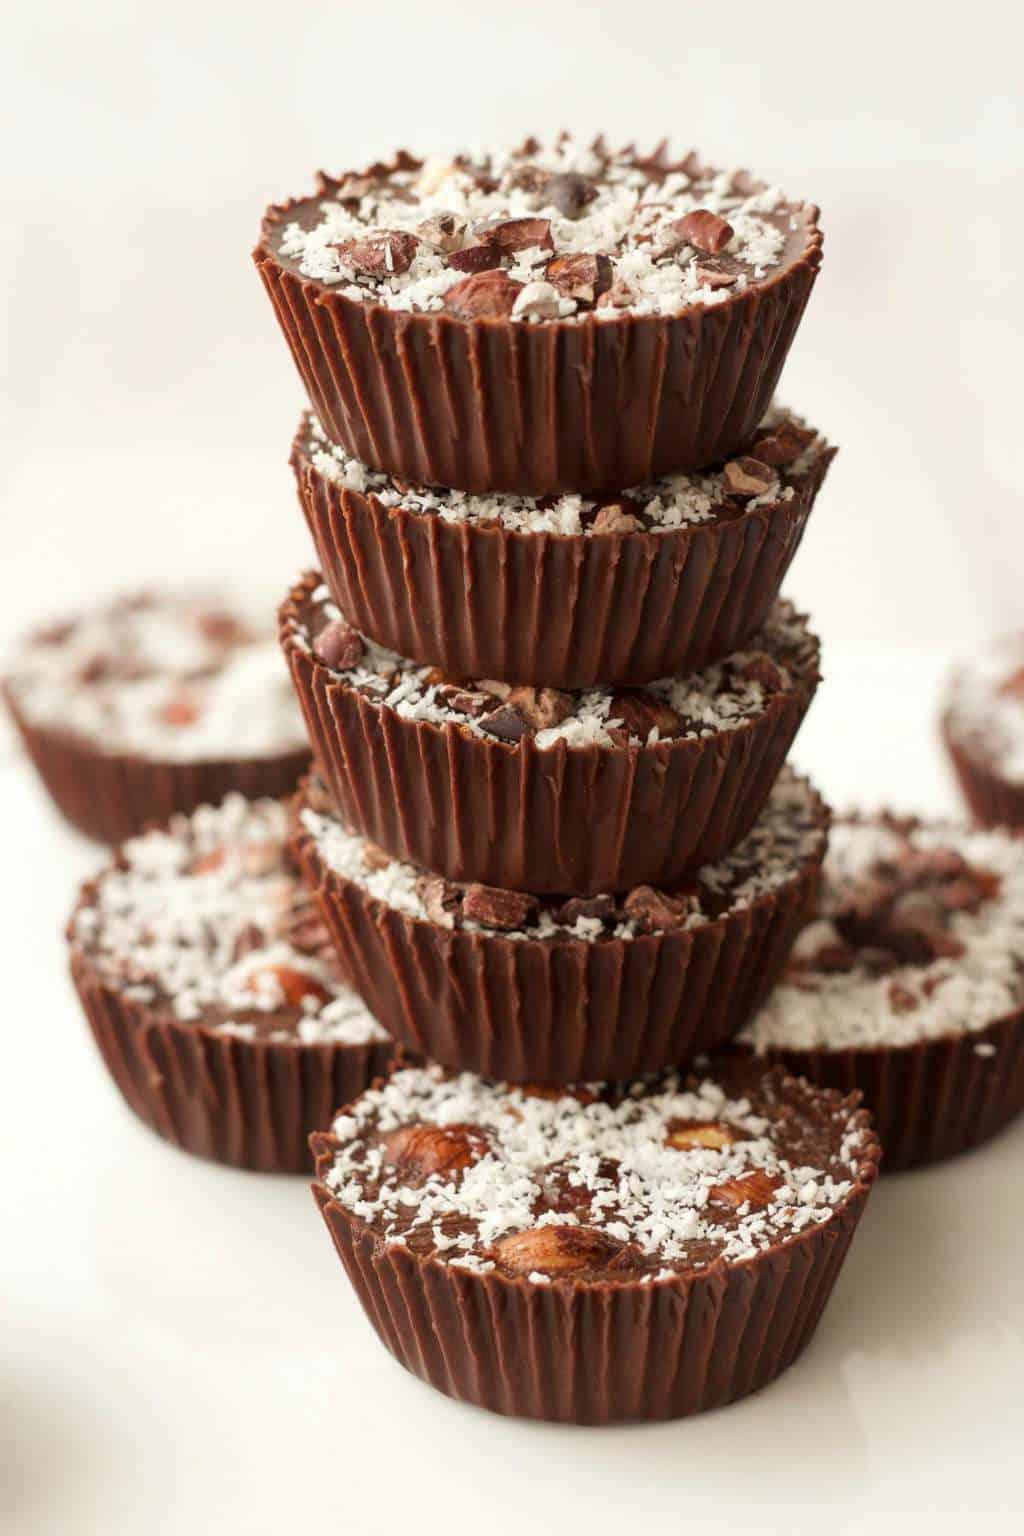 Raw Chocolate Hazelnut Cups #vegan #lovingitvegan #raw #rawvegan #chocolate #dessert #glutenfree #dairyfree